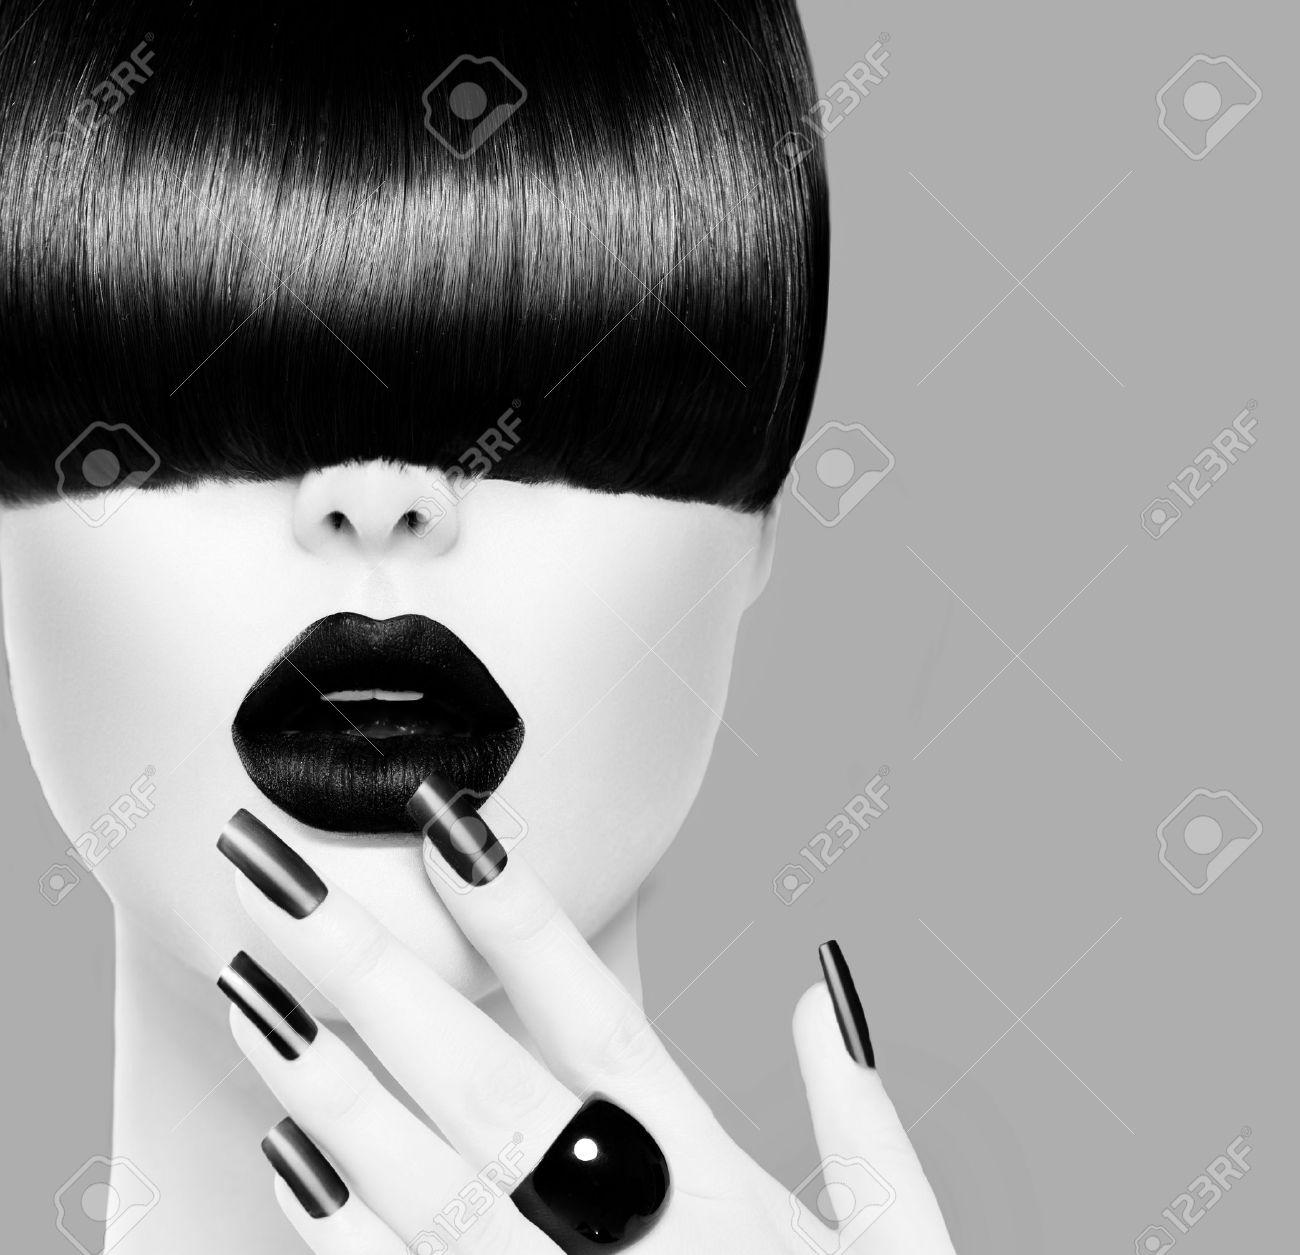 High Fashion Black and White Model Girl Portrait Stock Photo - 25059949